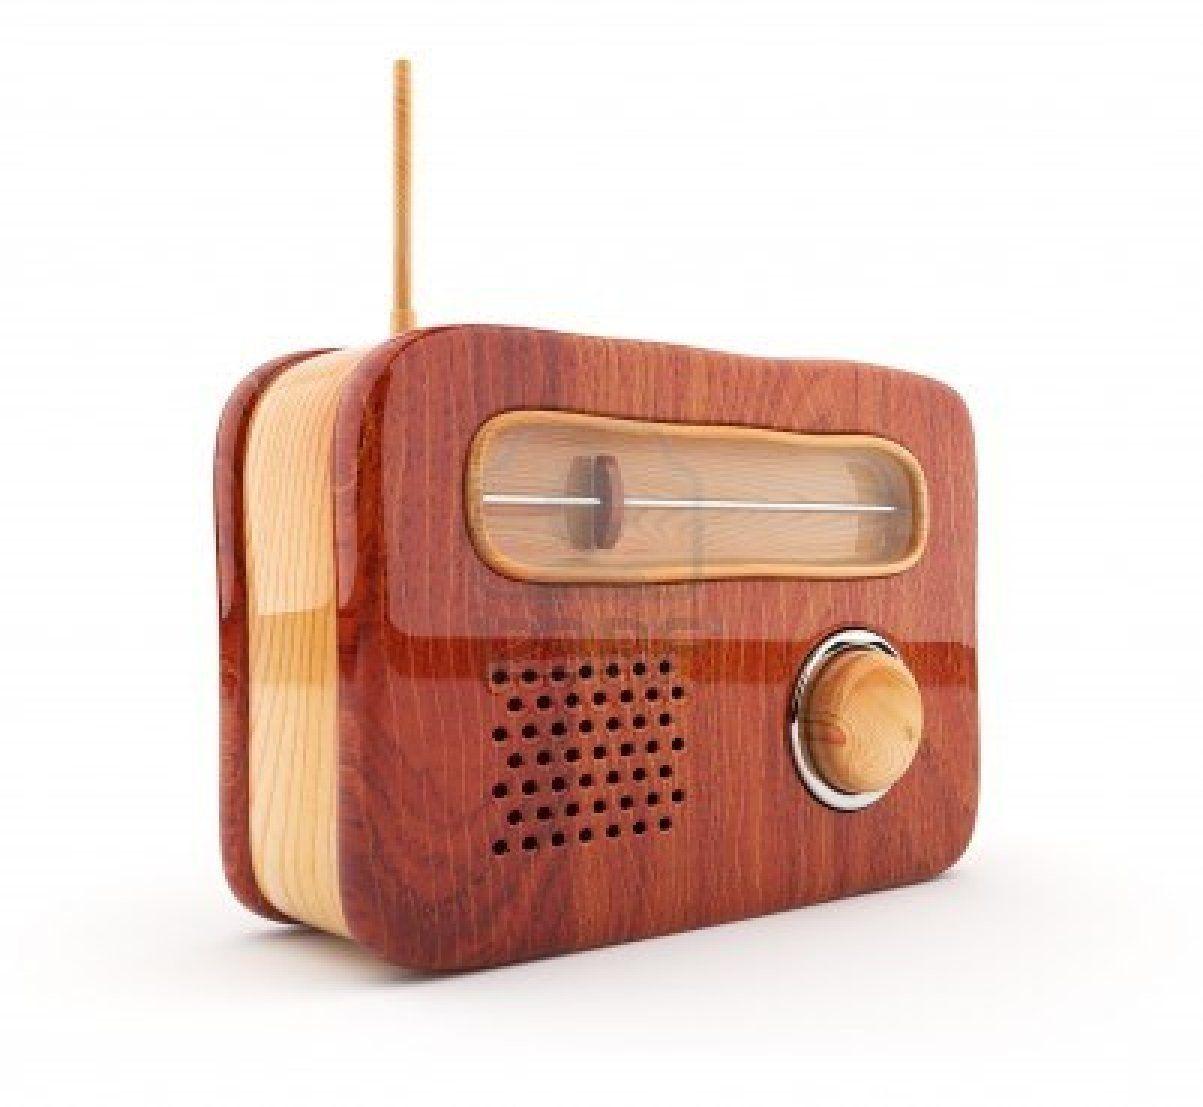 Wooden radio 3D  Retro style  Isolated on white  Stock Photo - 12780484